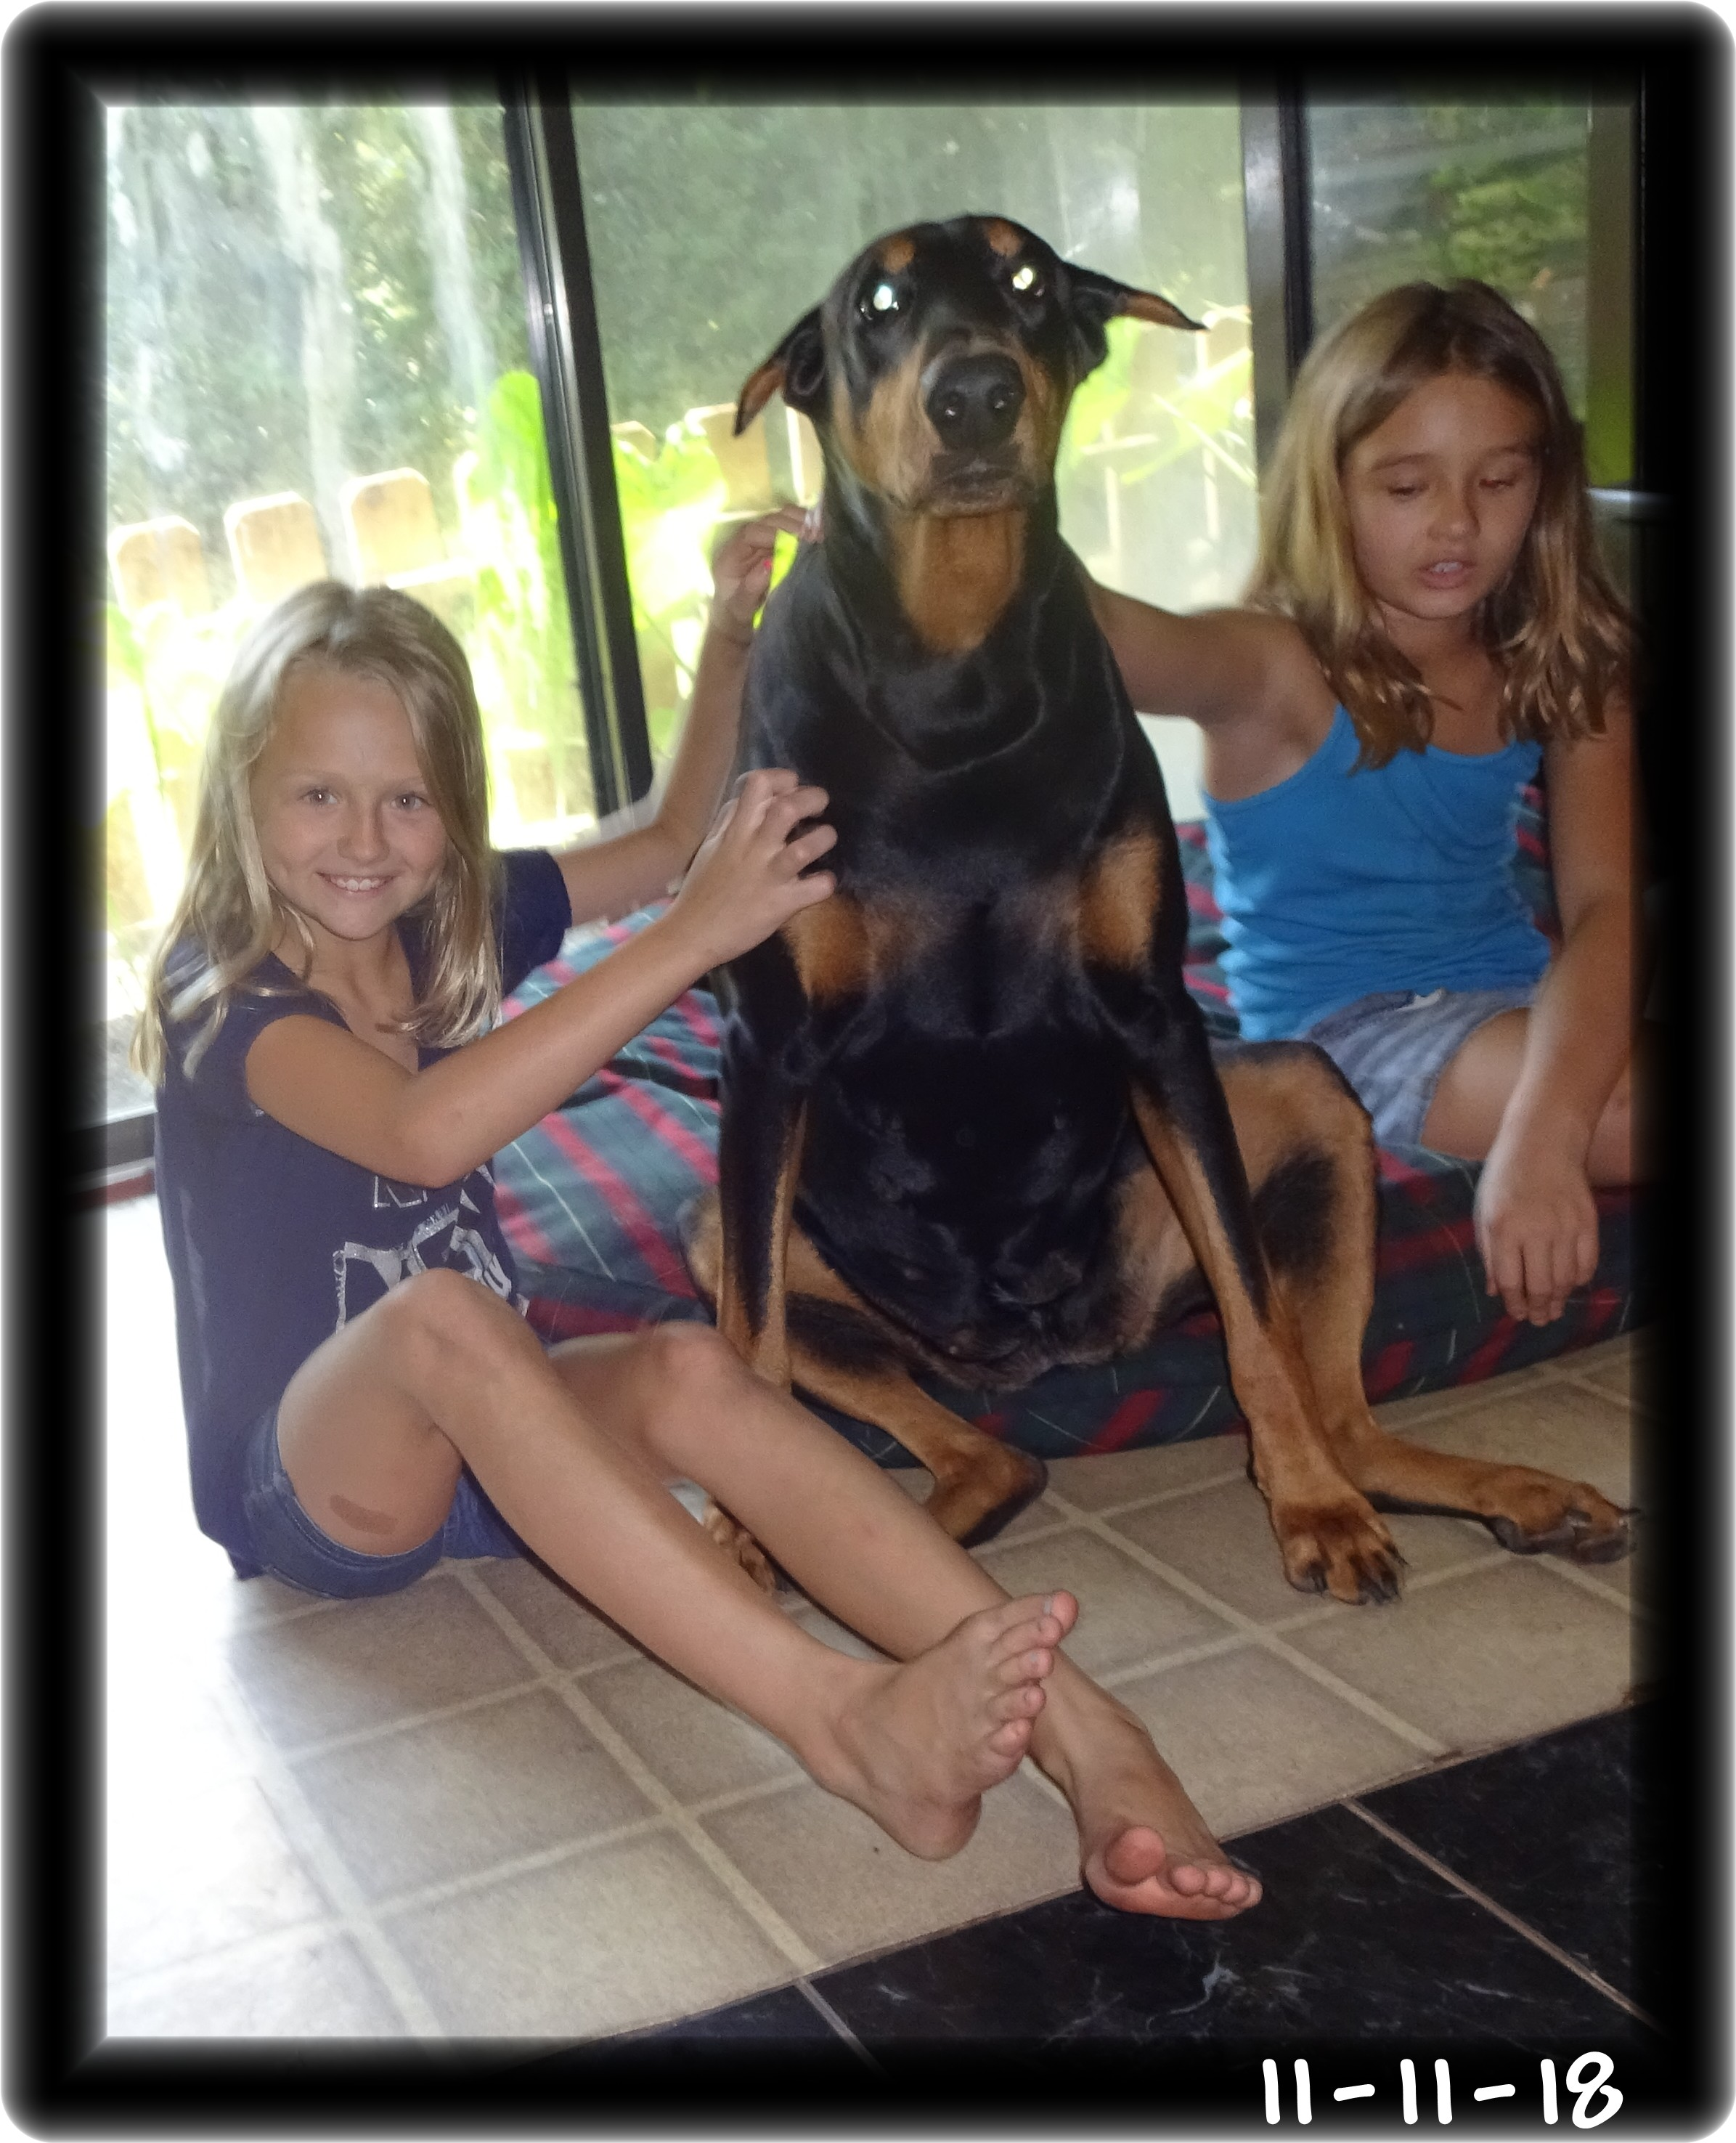 London & Caspian Mr. Hoytt's kids --- London is Miska's mom - Mr. Hoytt's first Dobe American Kennel Club Ch. Hoytt's Poco CD born 1958.